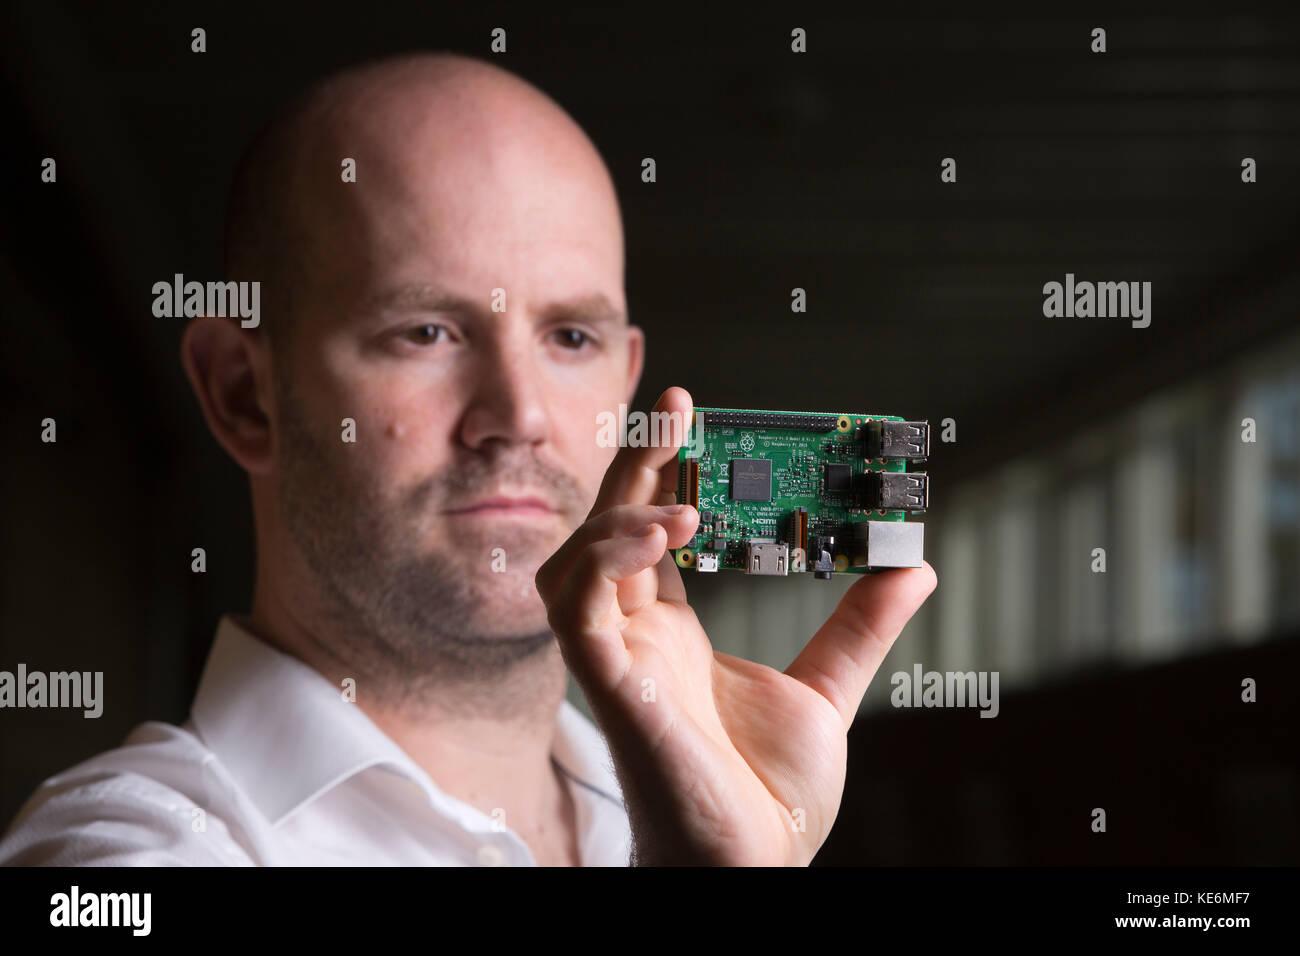 Eben Upton, creator of Raspberry Pi computer, at CamJam event in Cambridge, England, UK - Stock Image